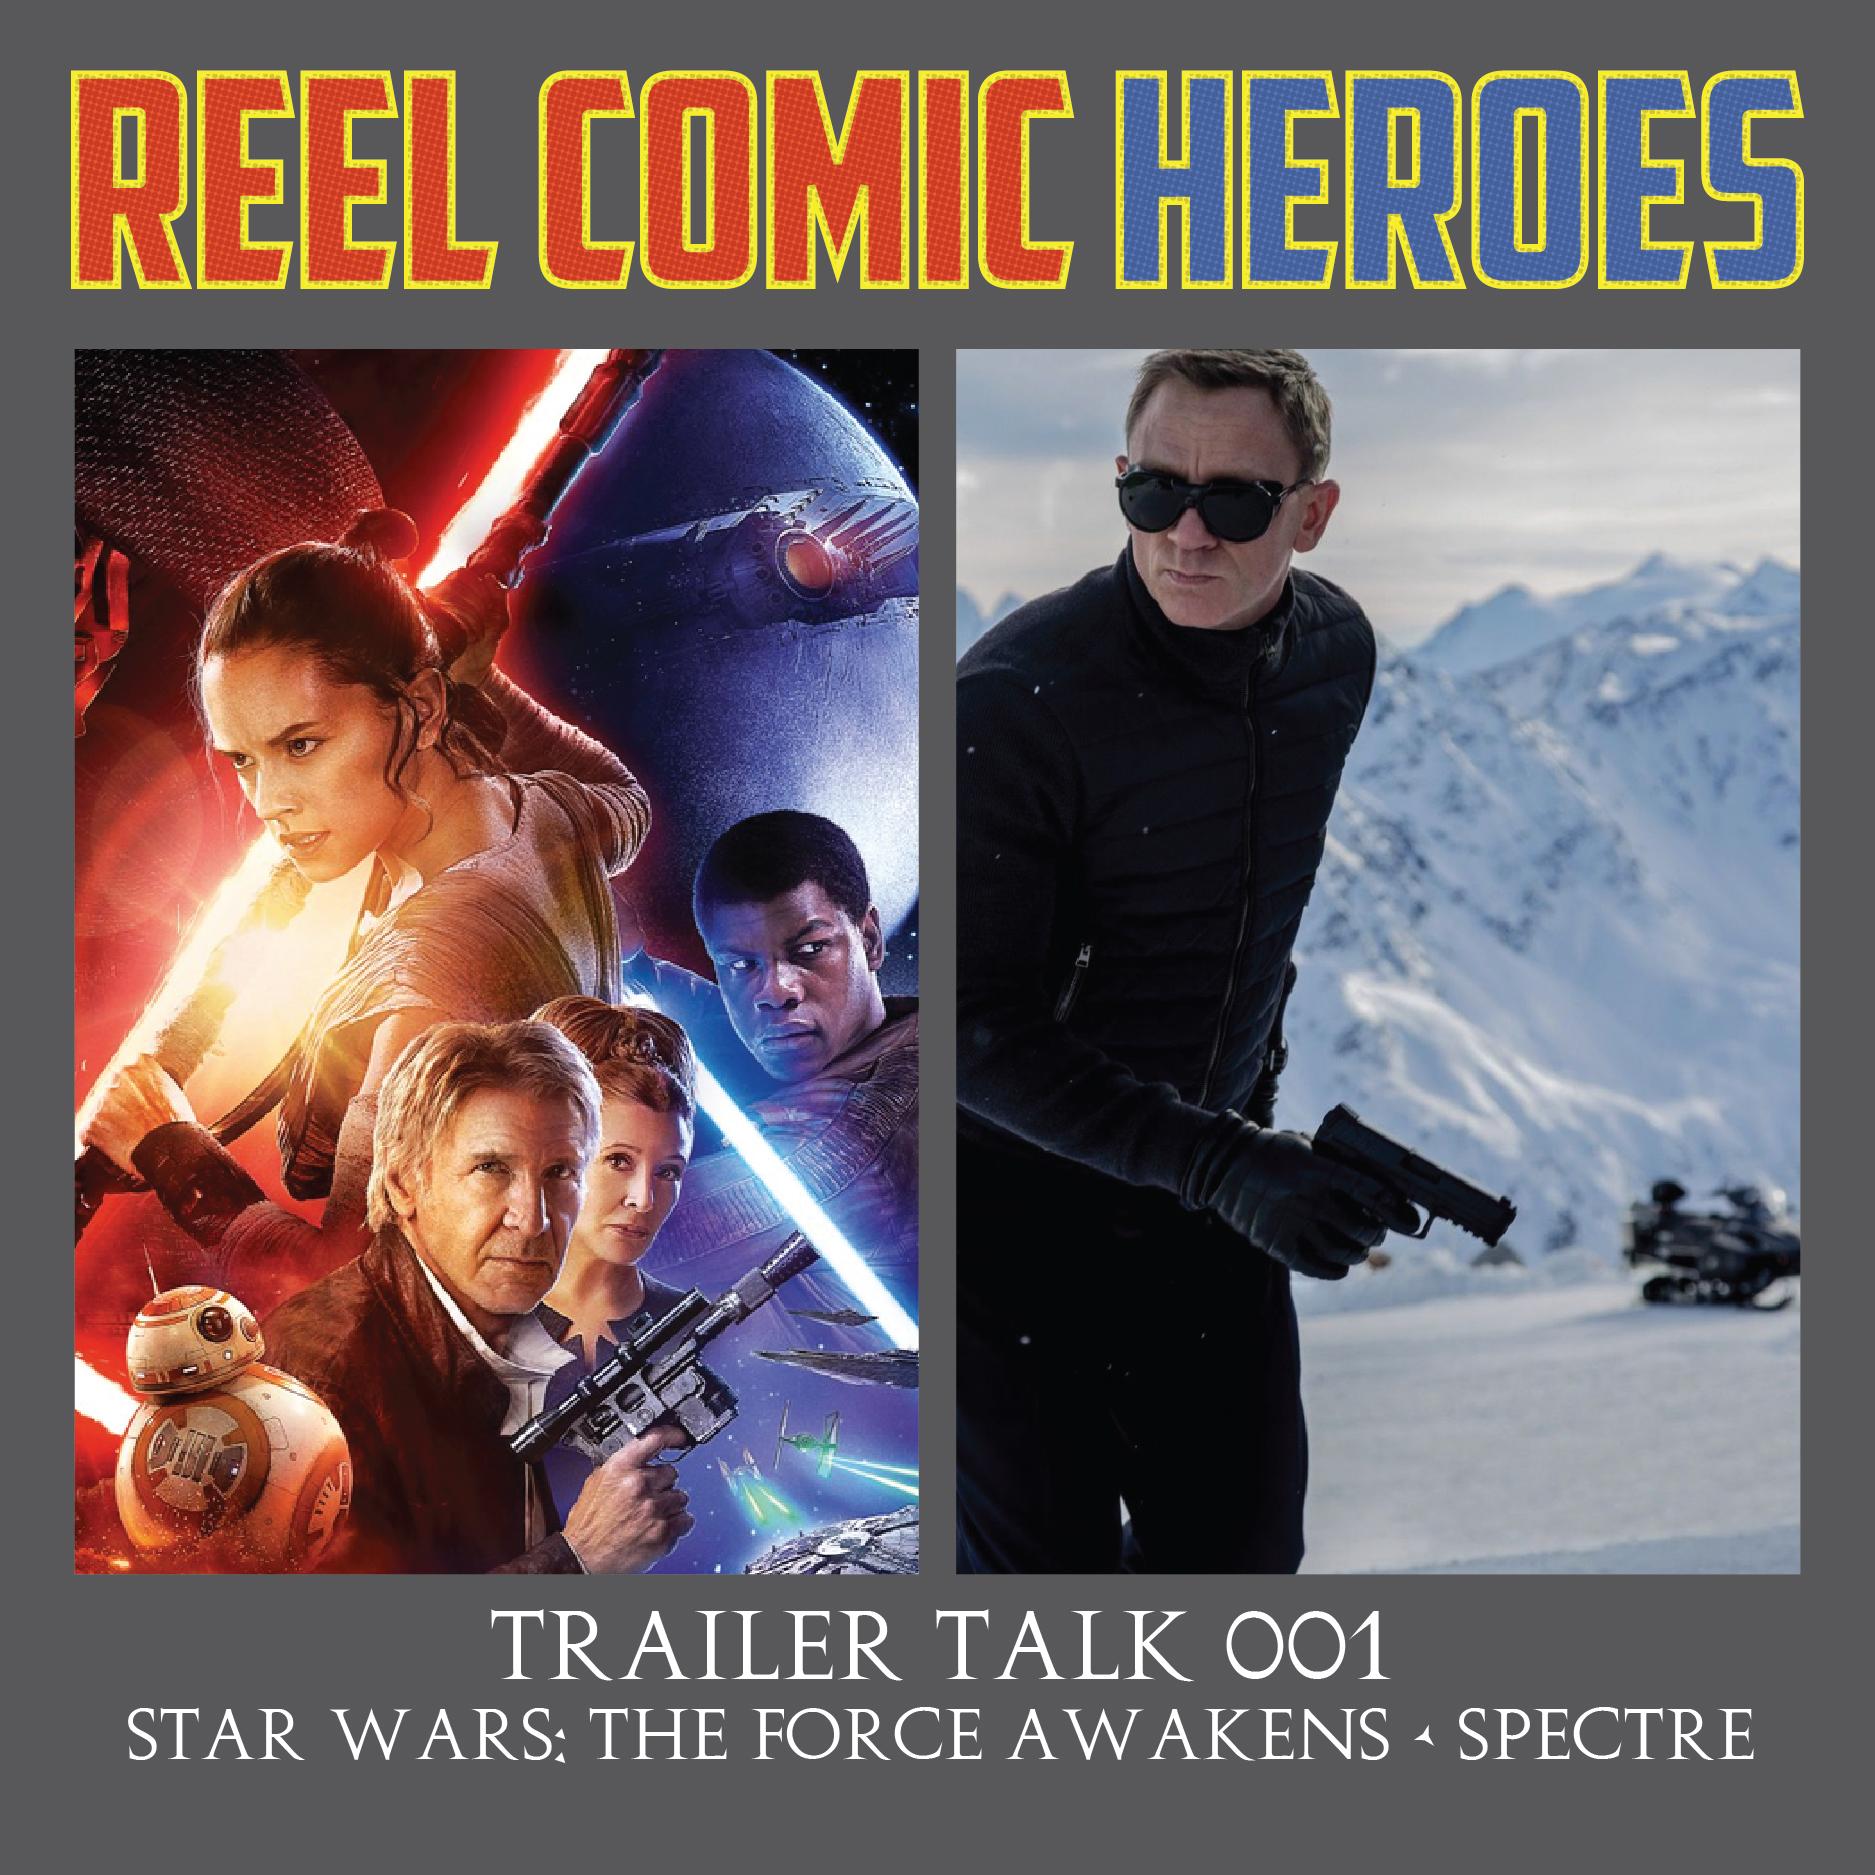 Artwork for Reel Comic Heroes - Trailer Talk 001